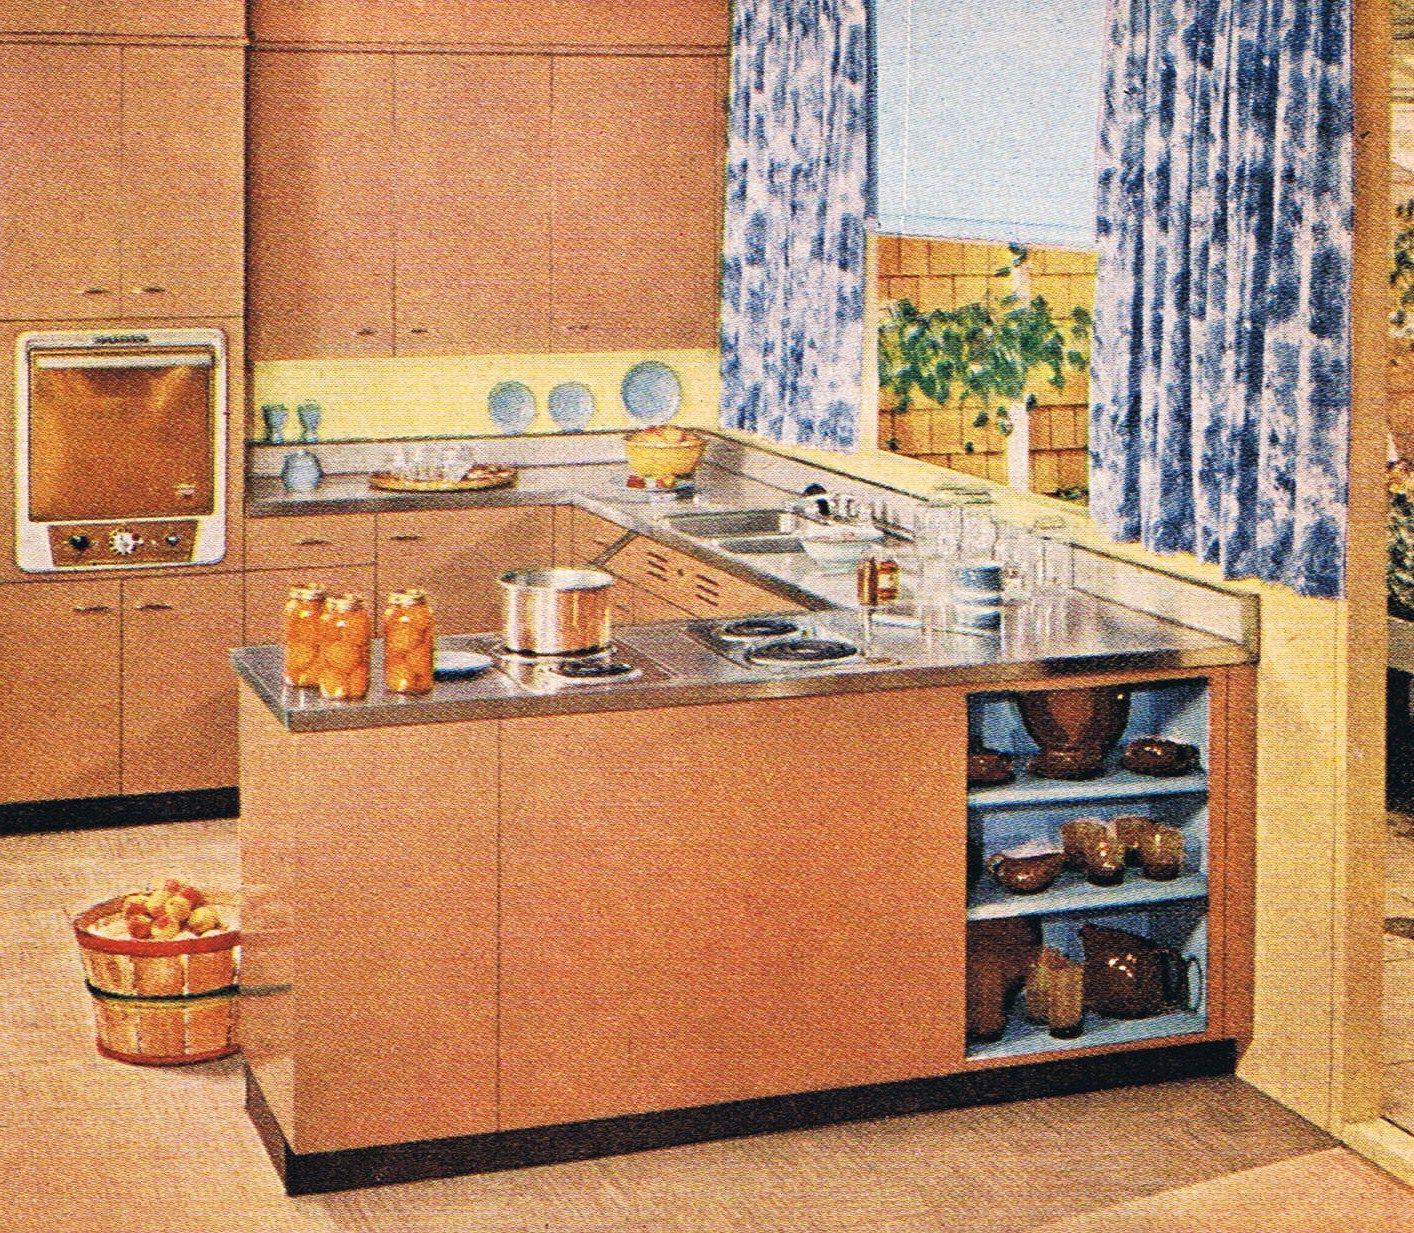 Best St Charles Cabinets 1950 S Copper Kitchen Retro 640 x 480